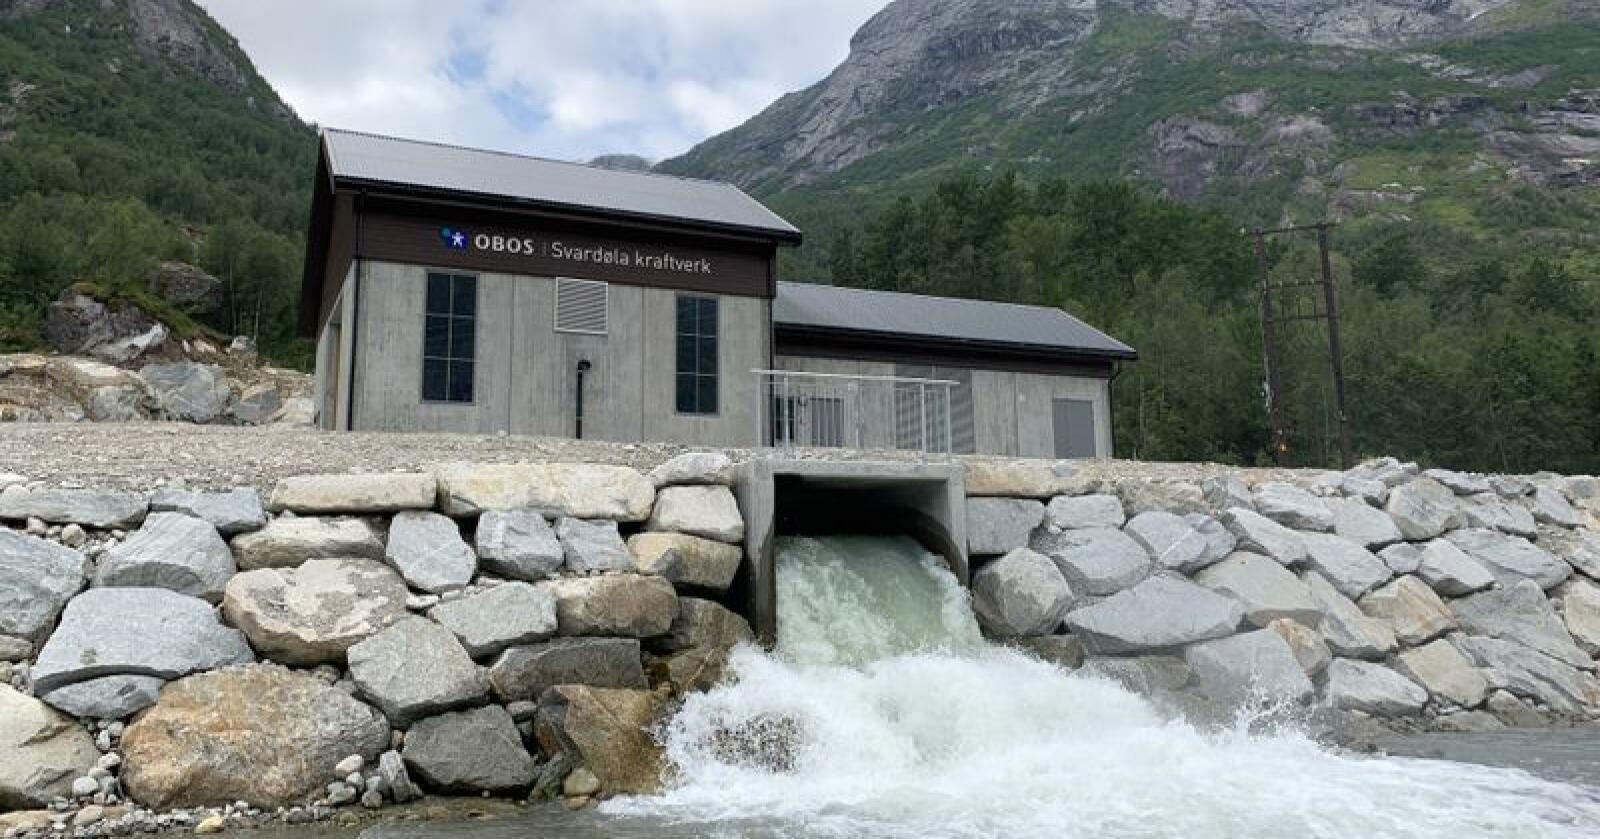 Svardøla vasskraftverk i Sogn og Fjordane. Foto: Obos